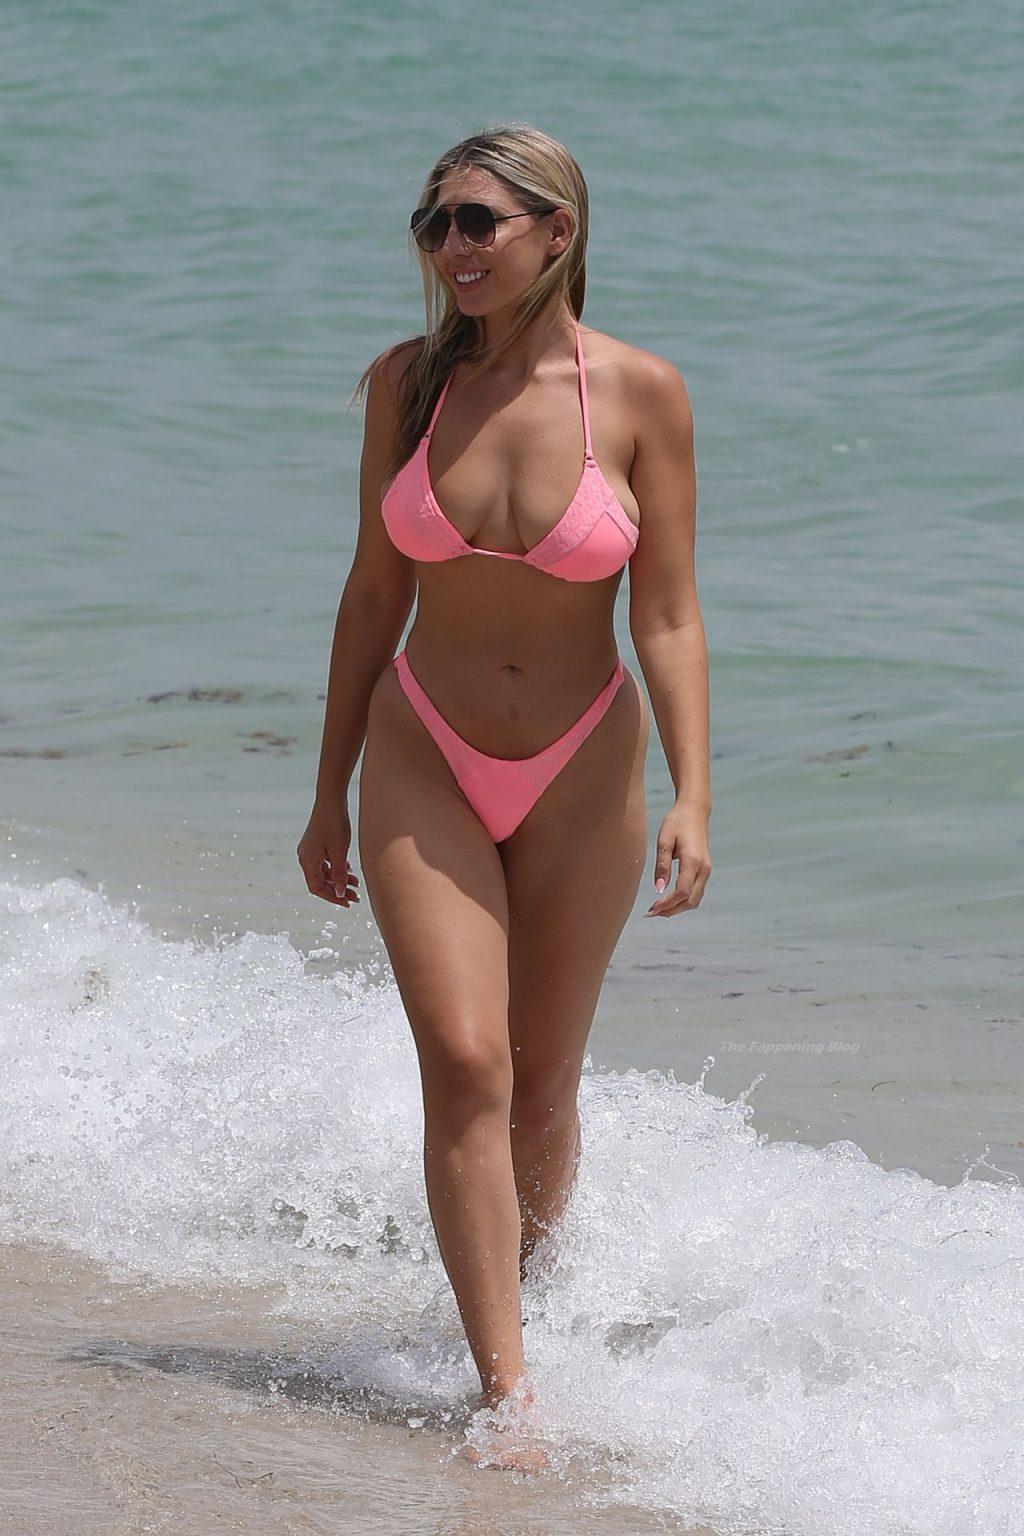 Victoria Larson Hits the Beach in Miami (18 Photos)